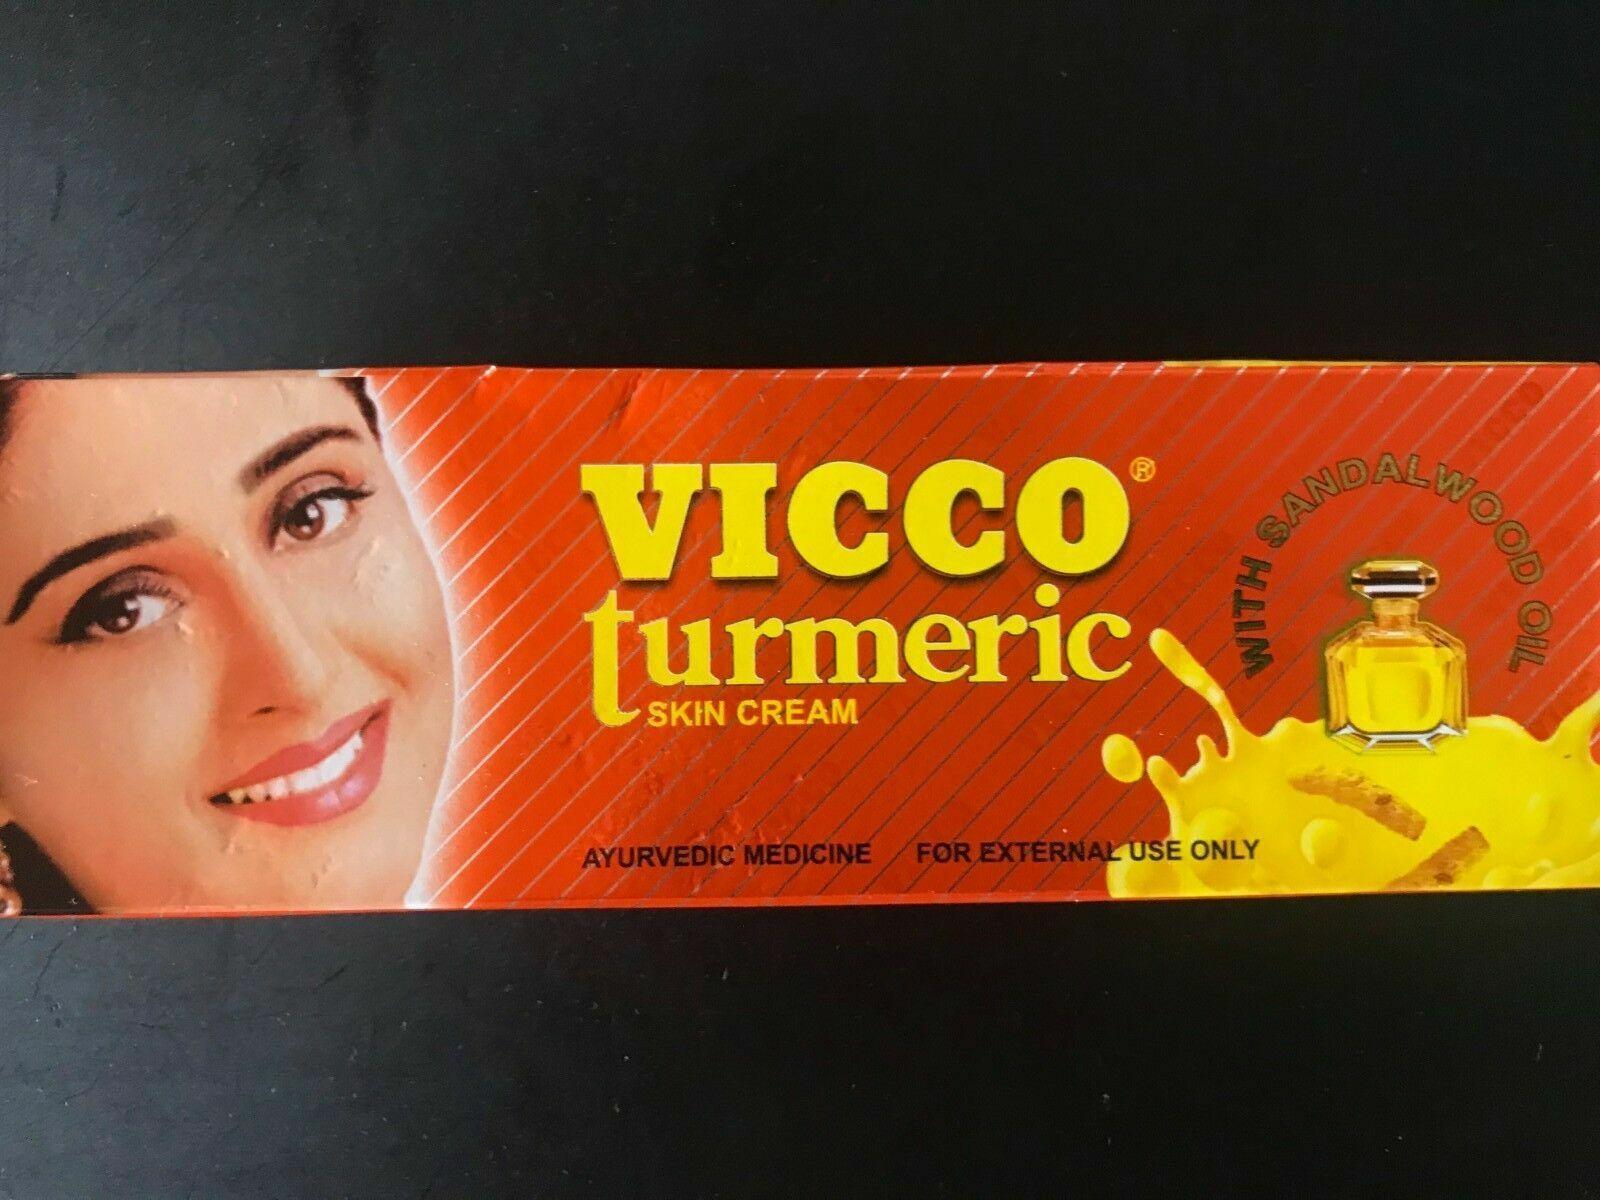 Vicco Turmeric Cream (Ayurvedische Haut-Creme mit Sandelholzöl) 15g Neu Verpackt